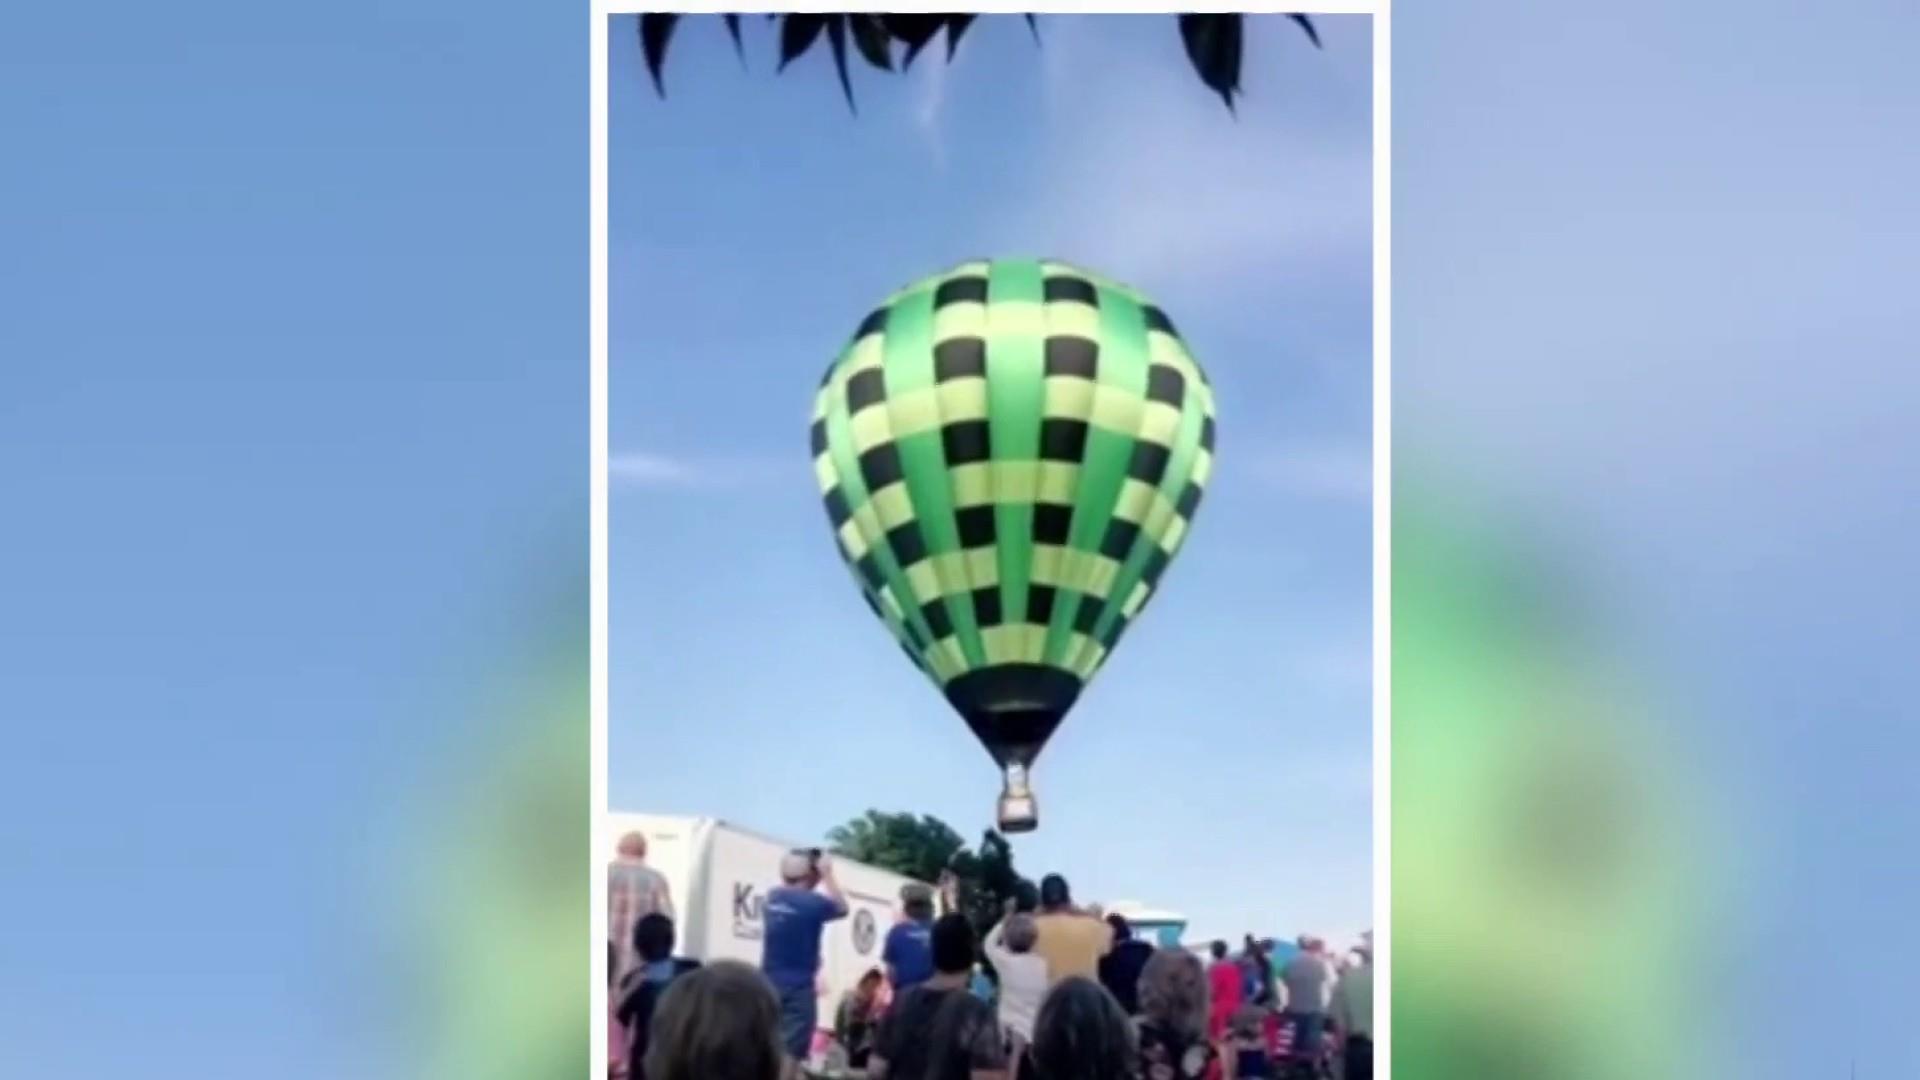 Hot air balloon crashes into crowd at Missouri festival